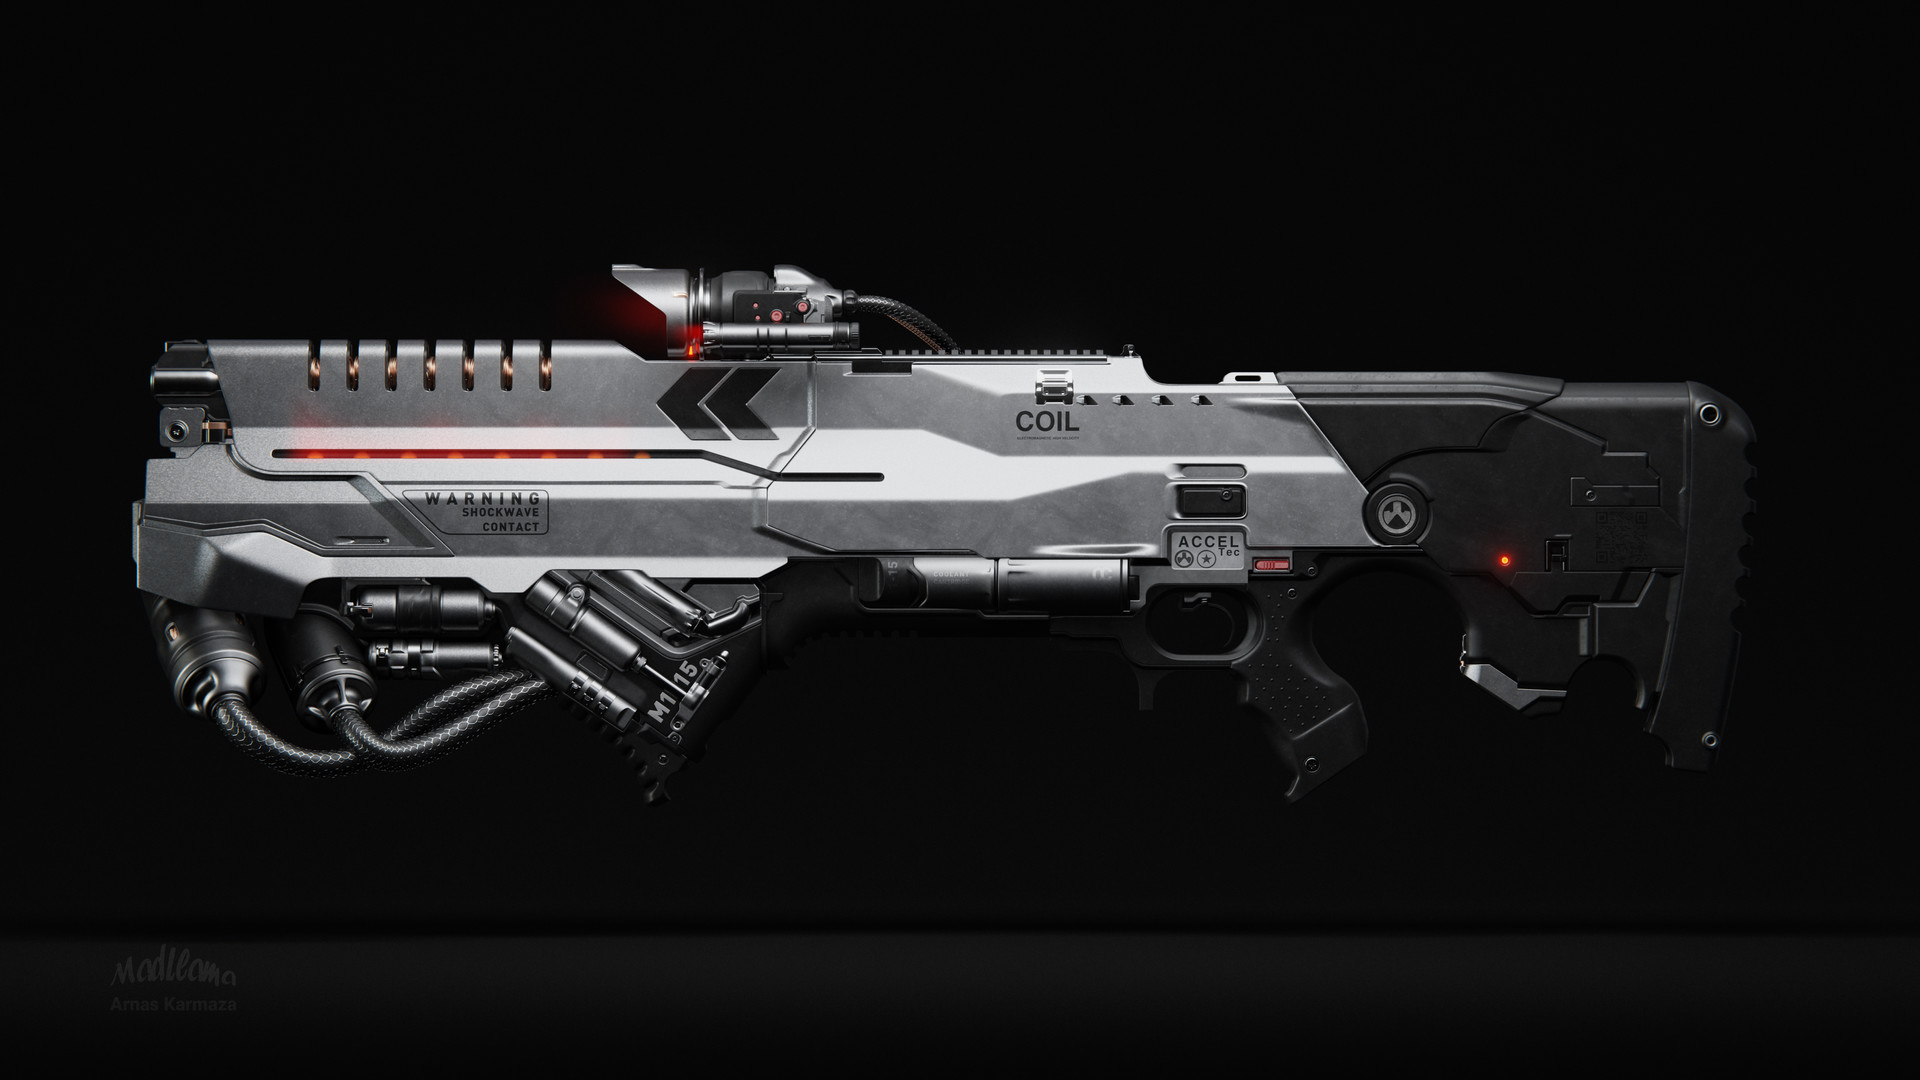 Mad Llama - Coil Railgun